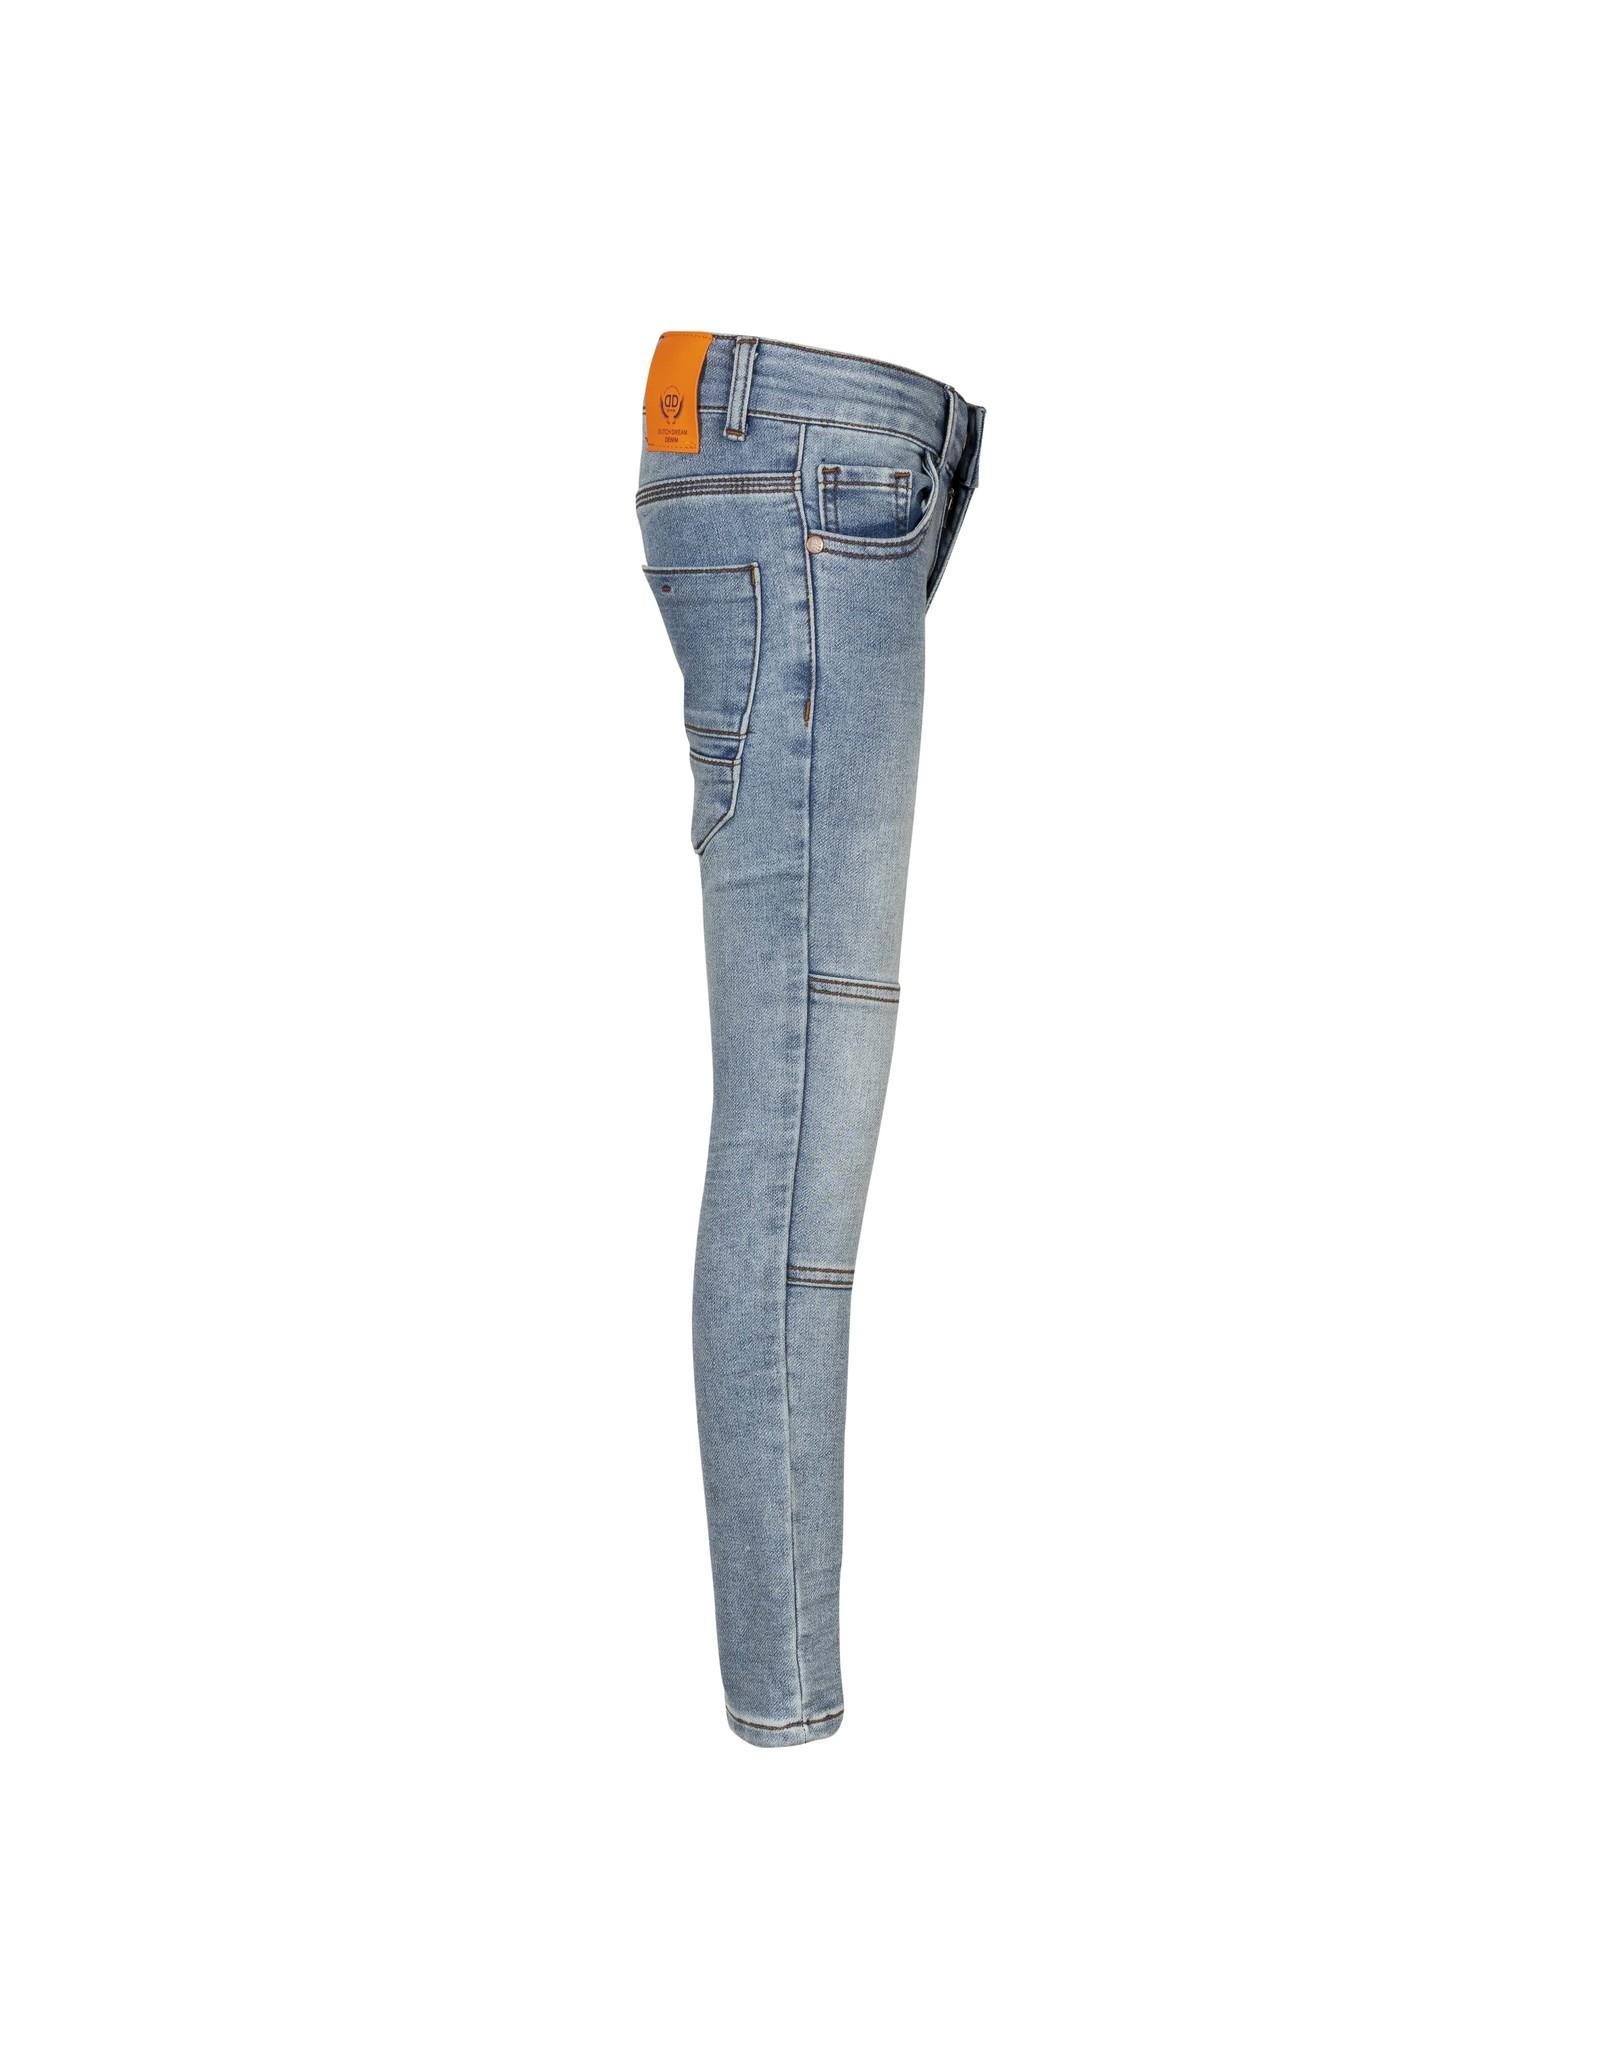 DDD DDD jongens extra slim fit jogg jeans Umbile Blue